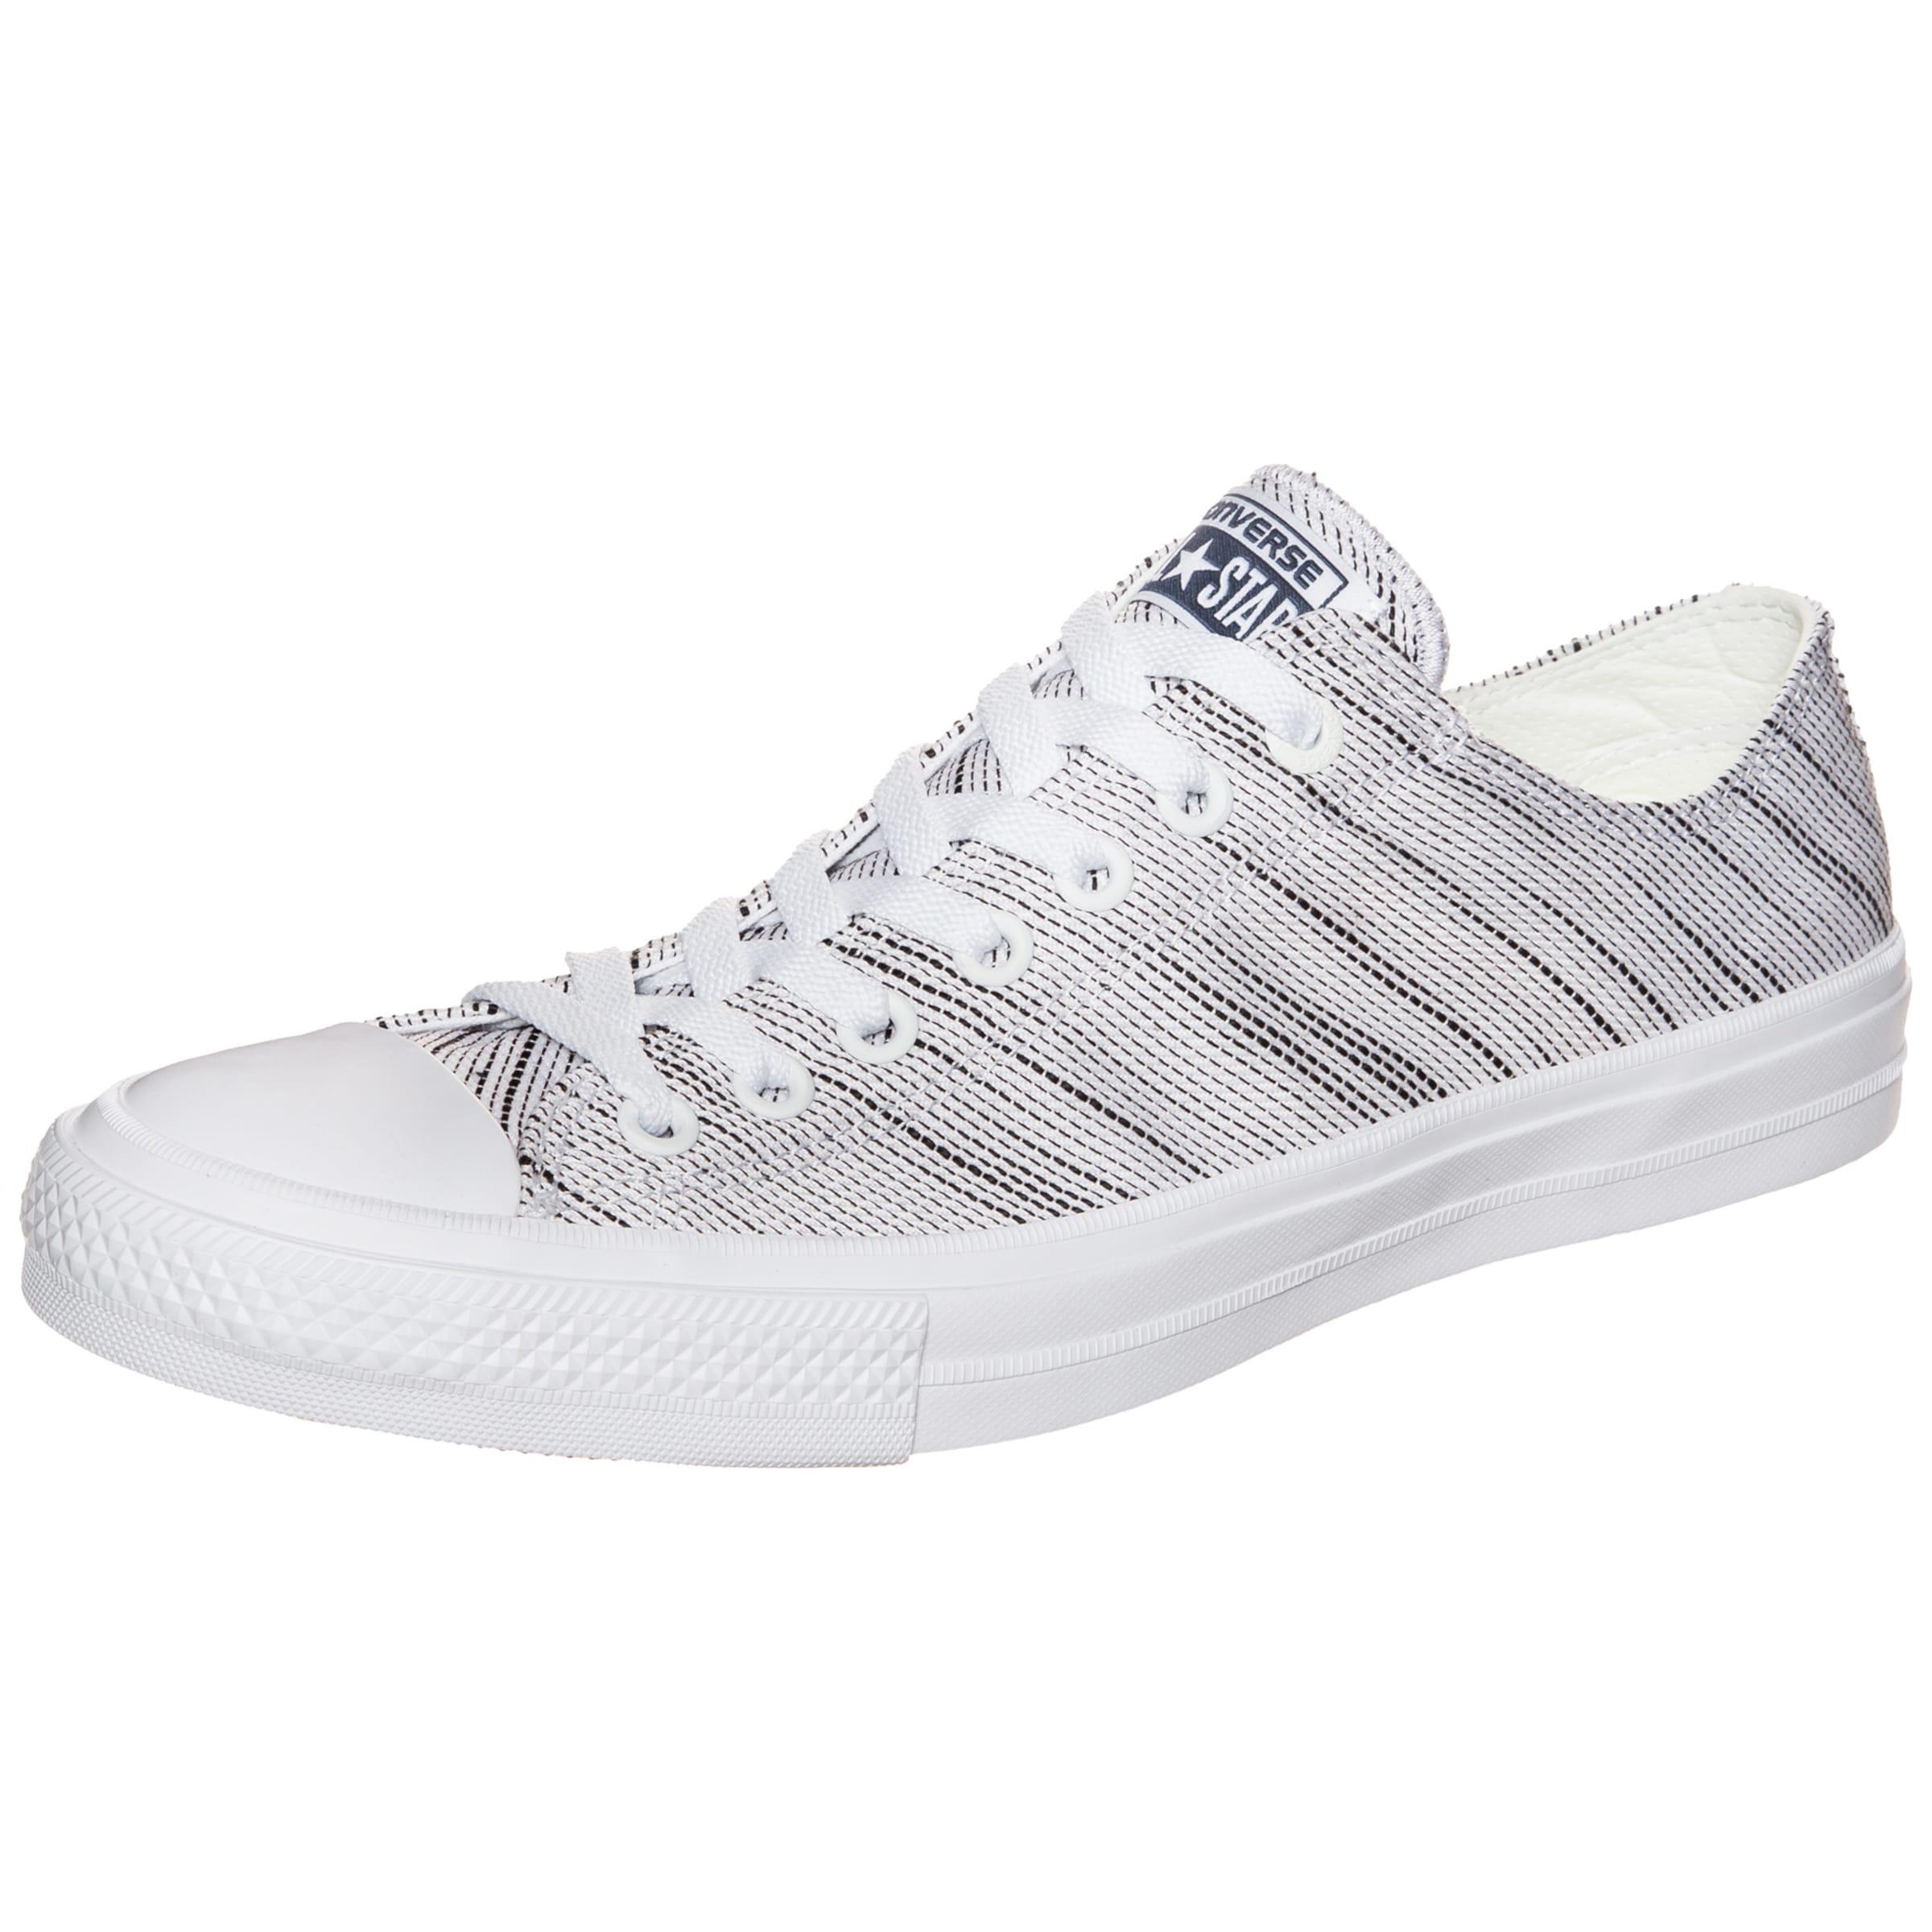 CONVERSE Chuck Taylor All Star II OX Sneaker